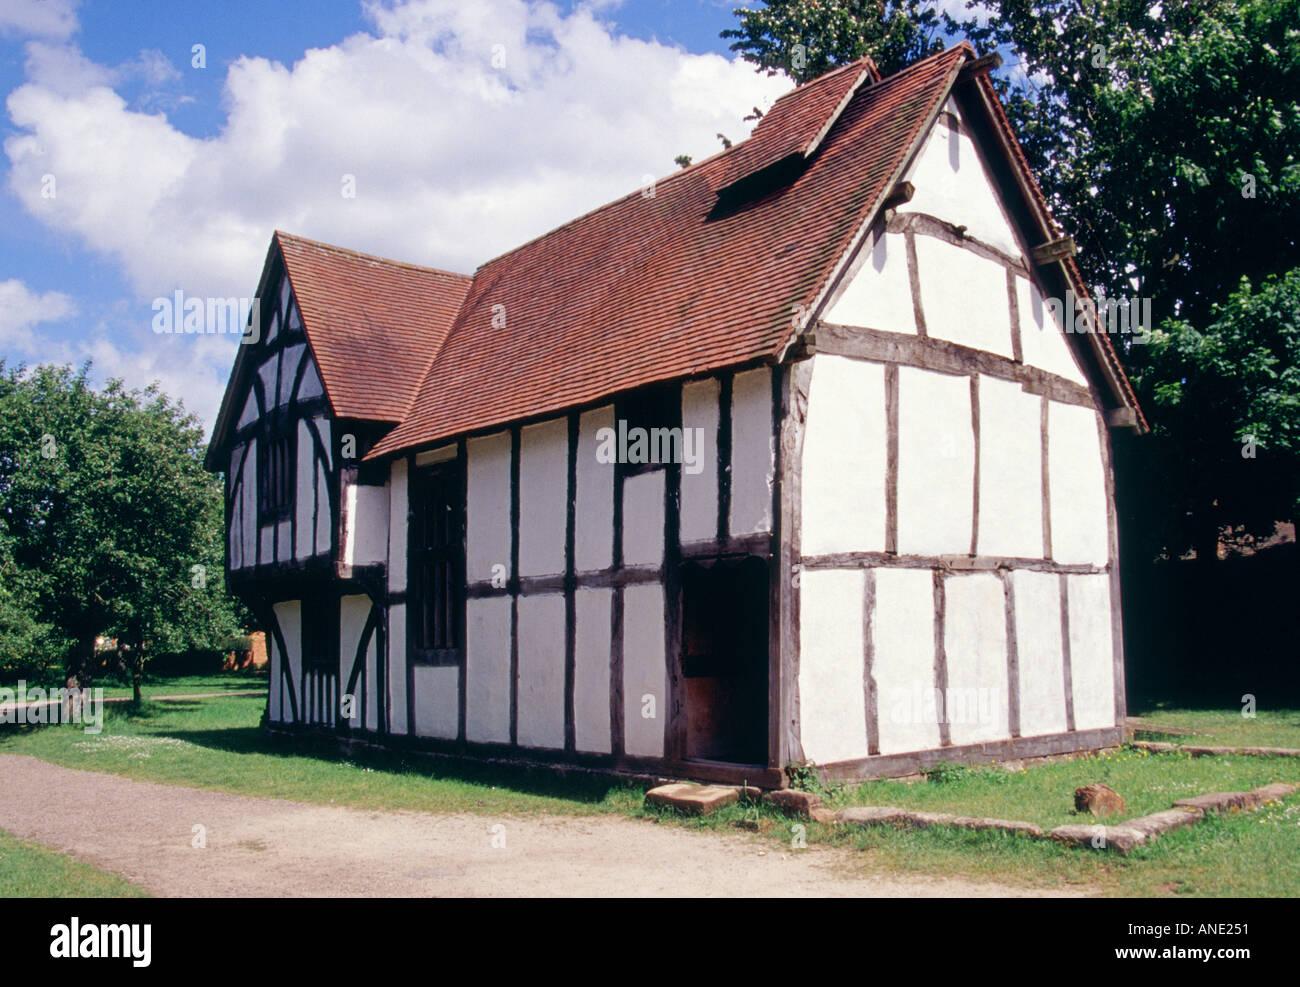 PRESERVED HOUSE AVONCROFT MUSEUM WORCESTERSHIRE ENGLAND UK - Stock Image